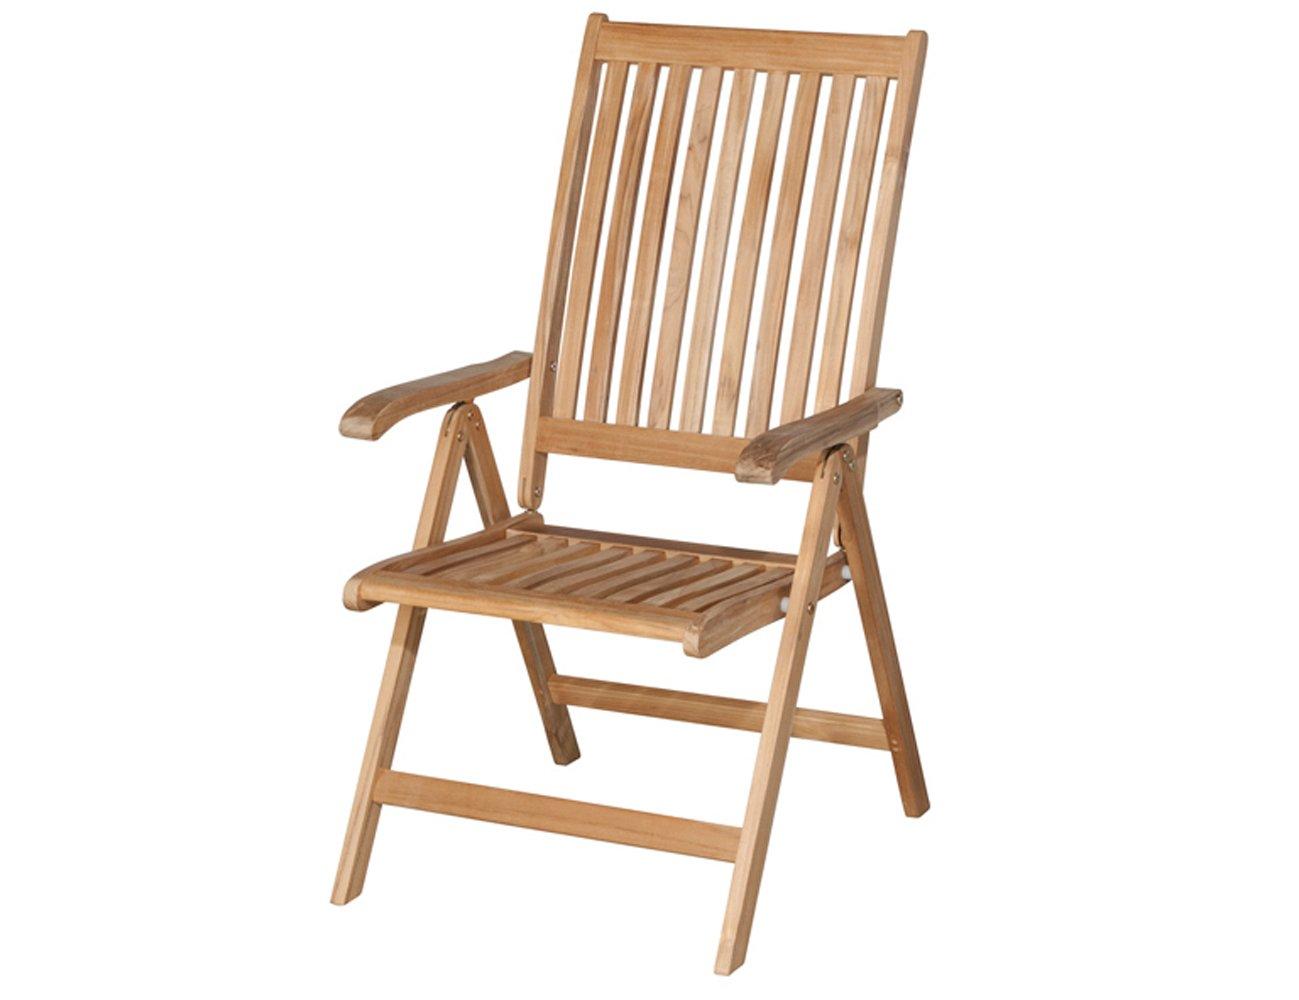 siena garden 672852 klappsessel newport teakholz fsc 100 beschl ge aus galvanisiertem stahl. Black Bedroom Furniture Sets. Home Design Ideas